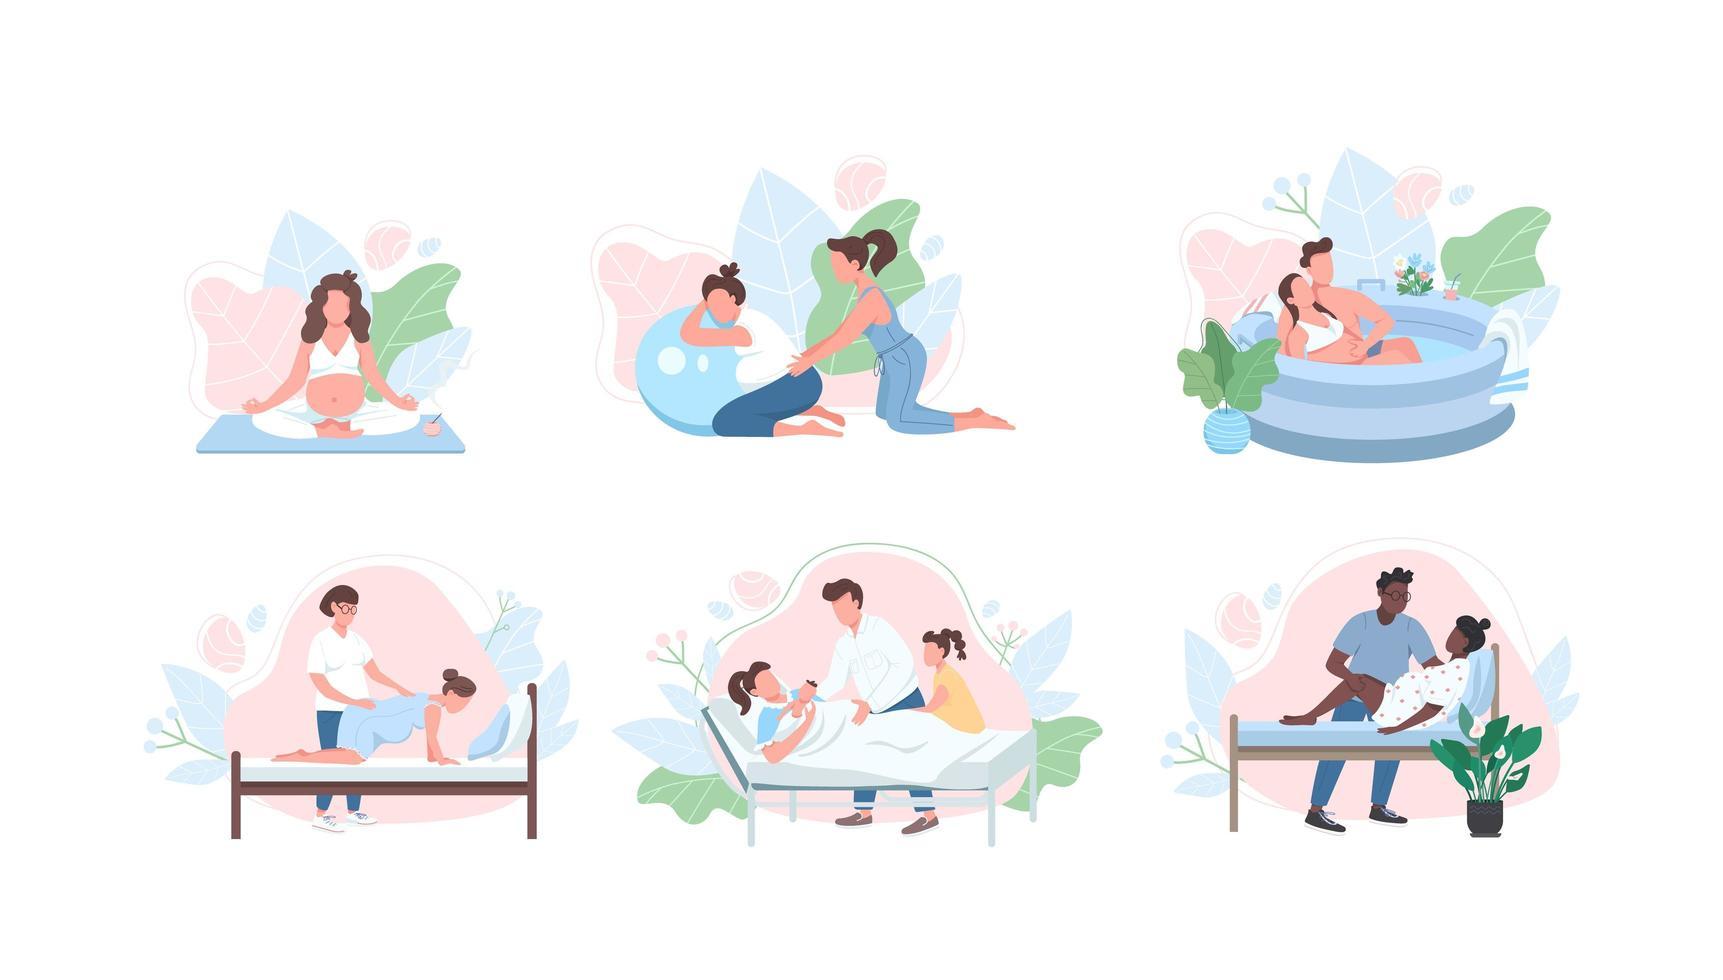 prenatale zorg egale kleur vector gezichtsloze tekenset